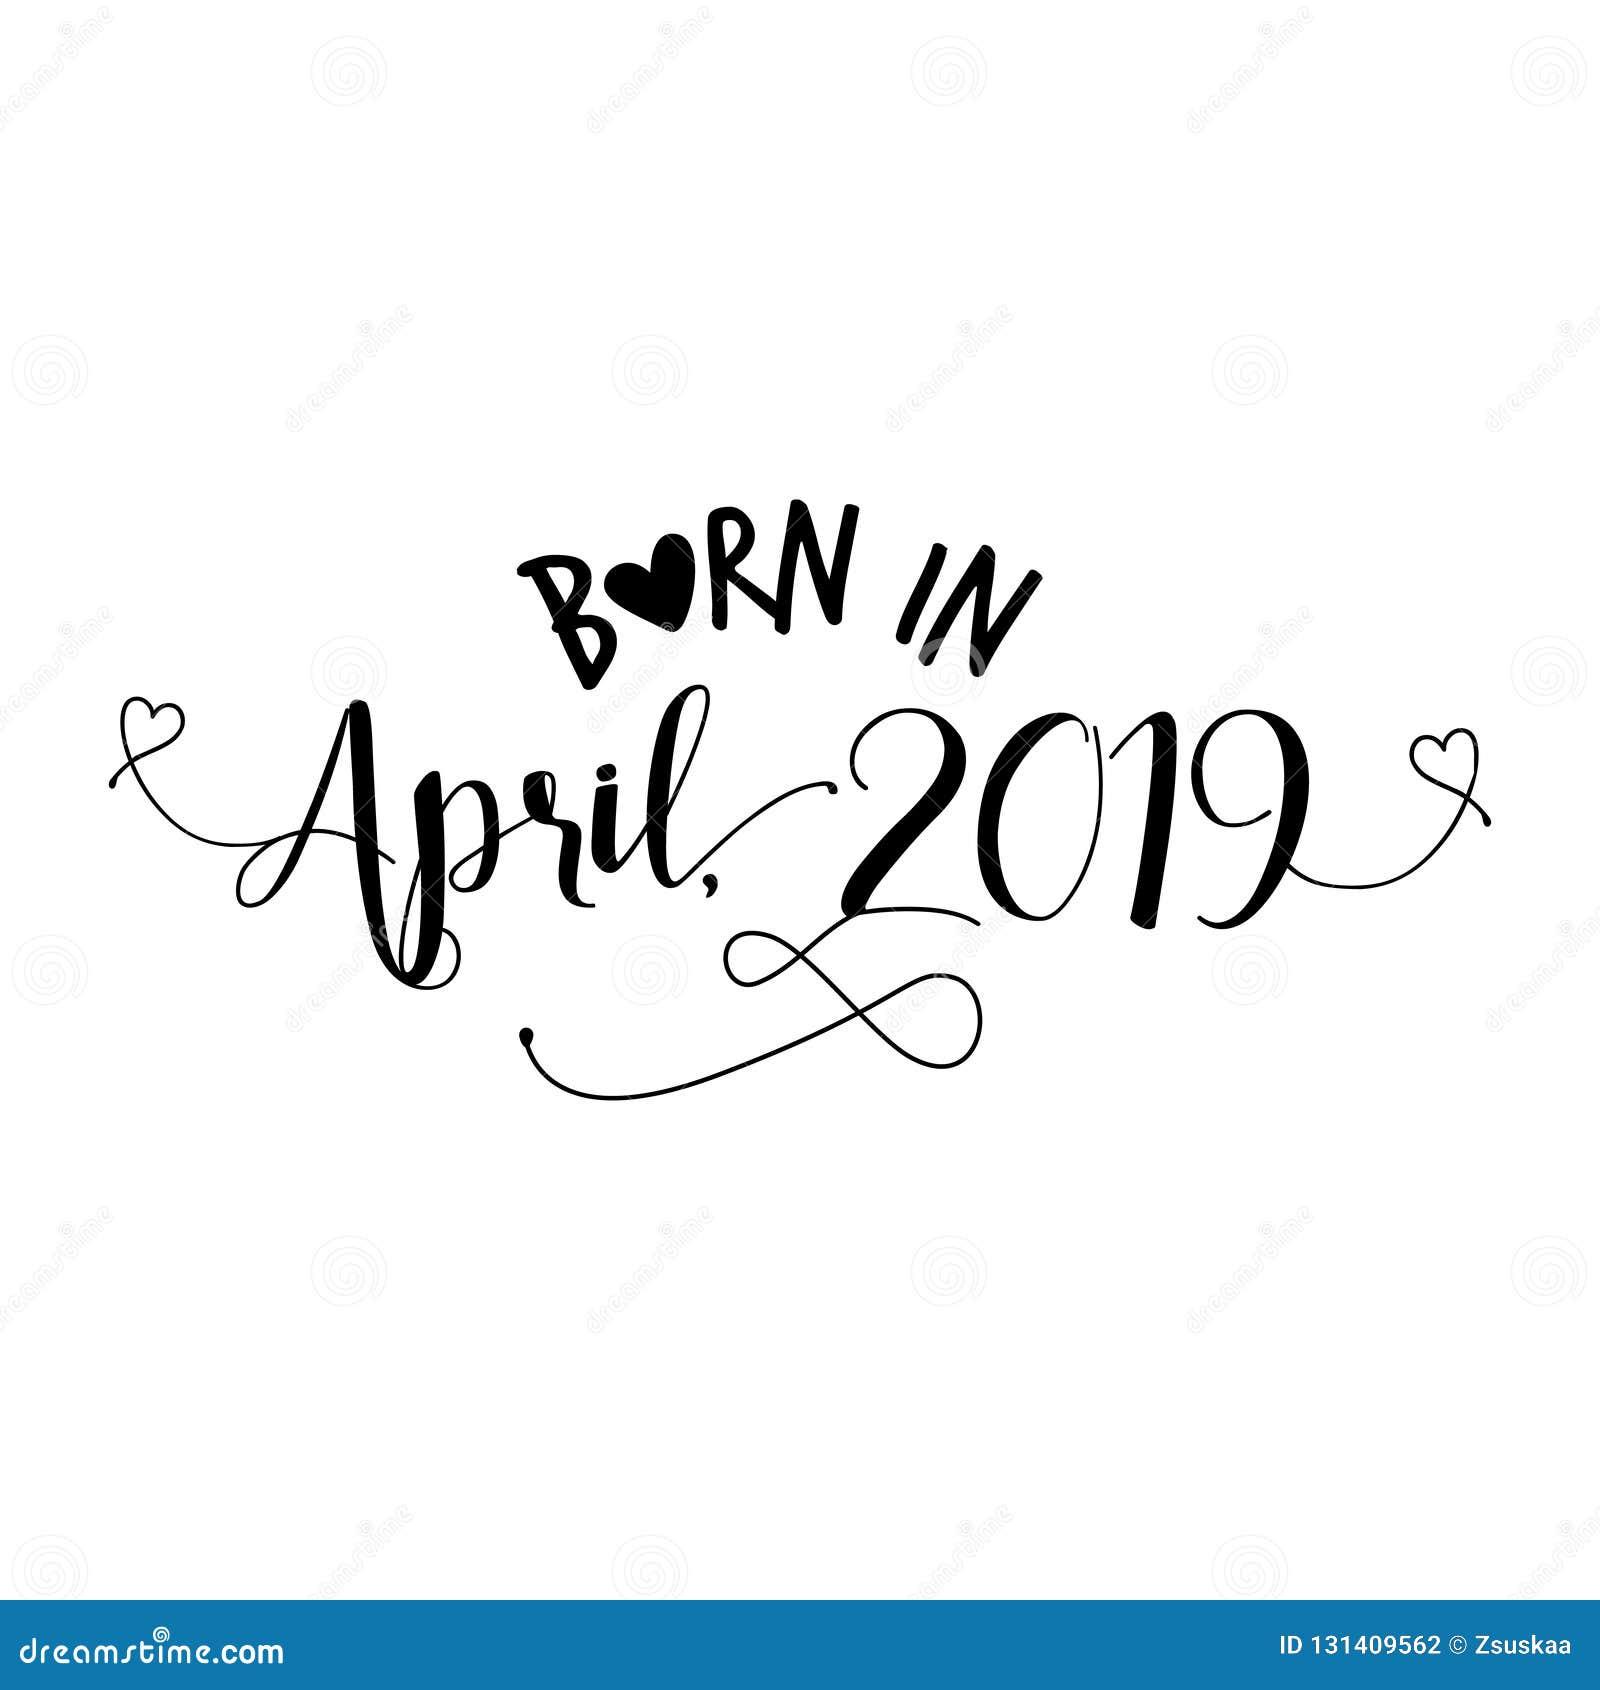 Born in April 2019 - Nursery vector illustration.